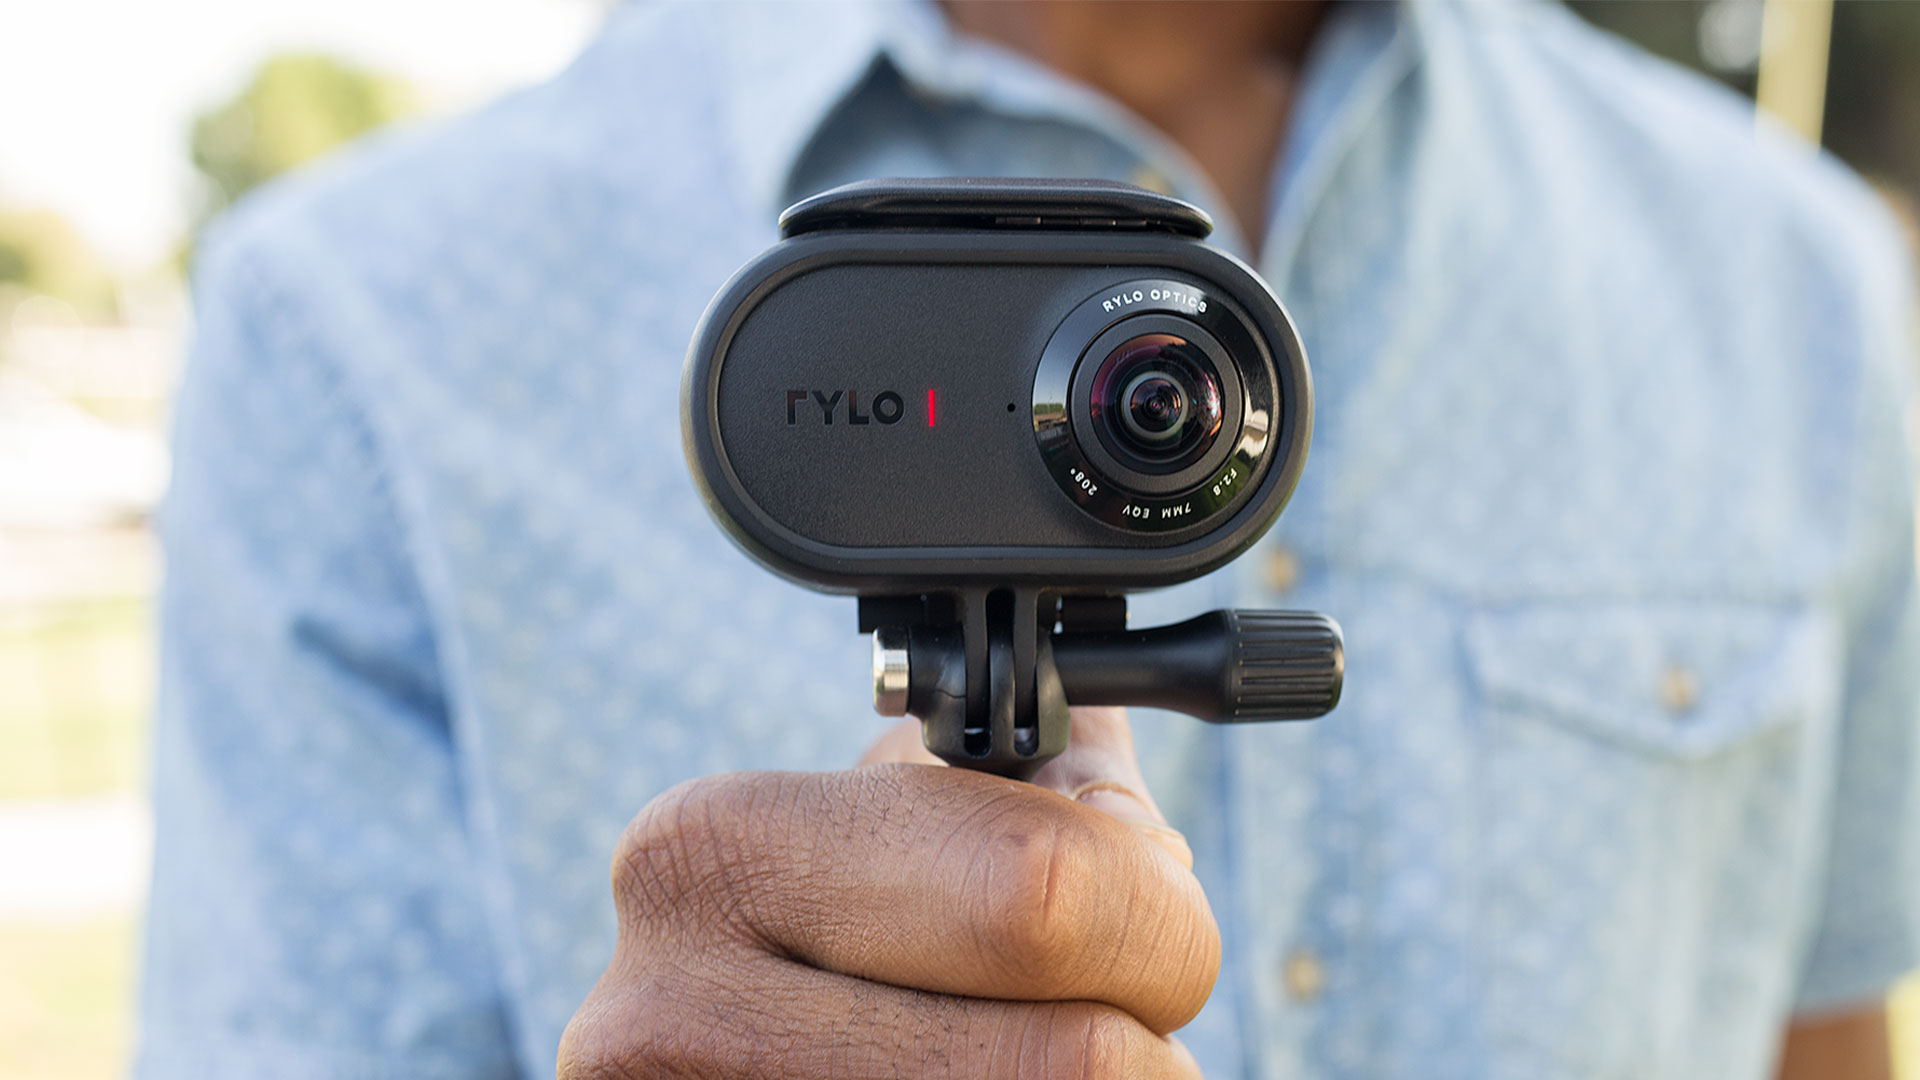 Rylo 4K 360° カメラ - 小型軽量でスマートフォンで編集ができる全方位カメラ